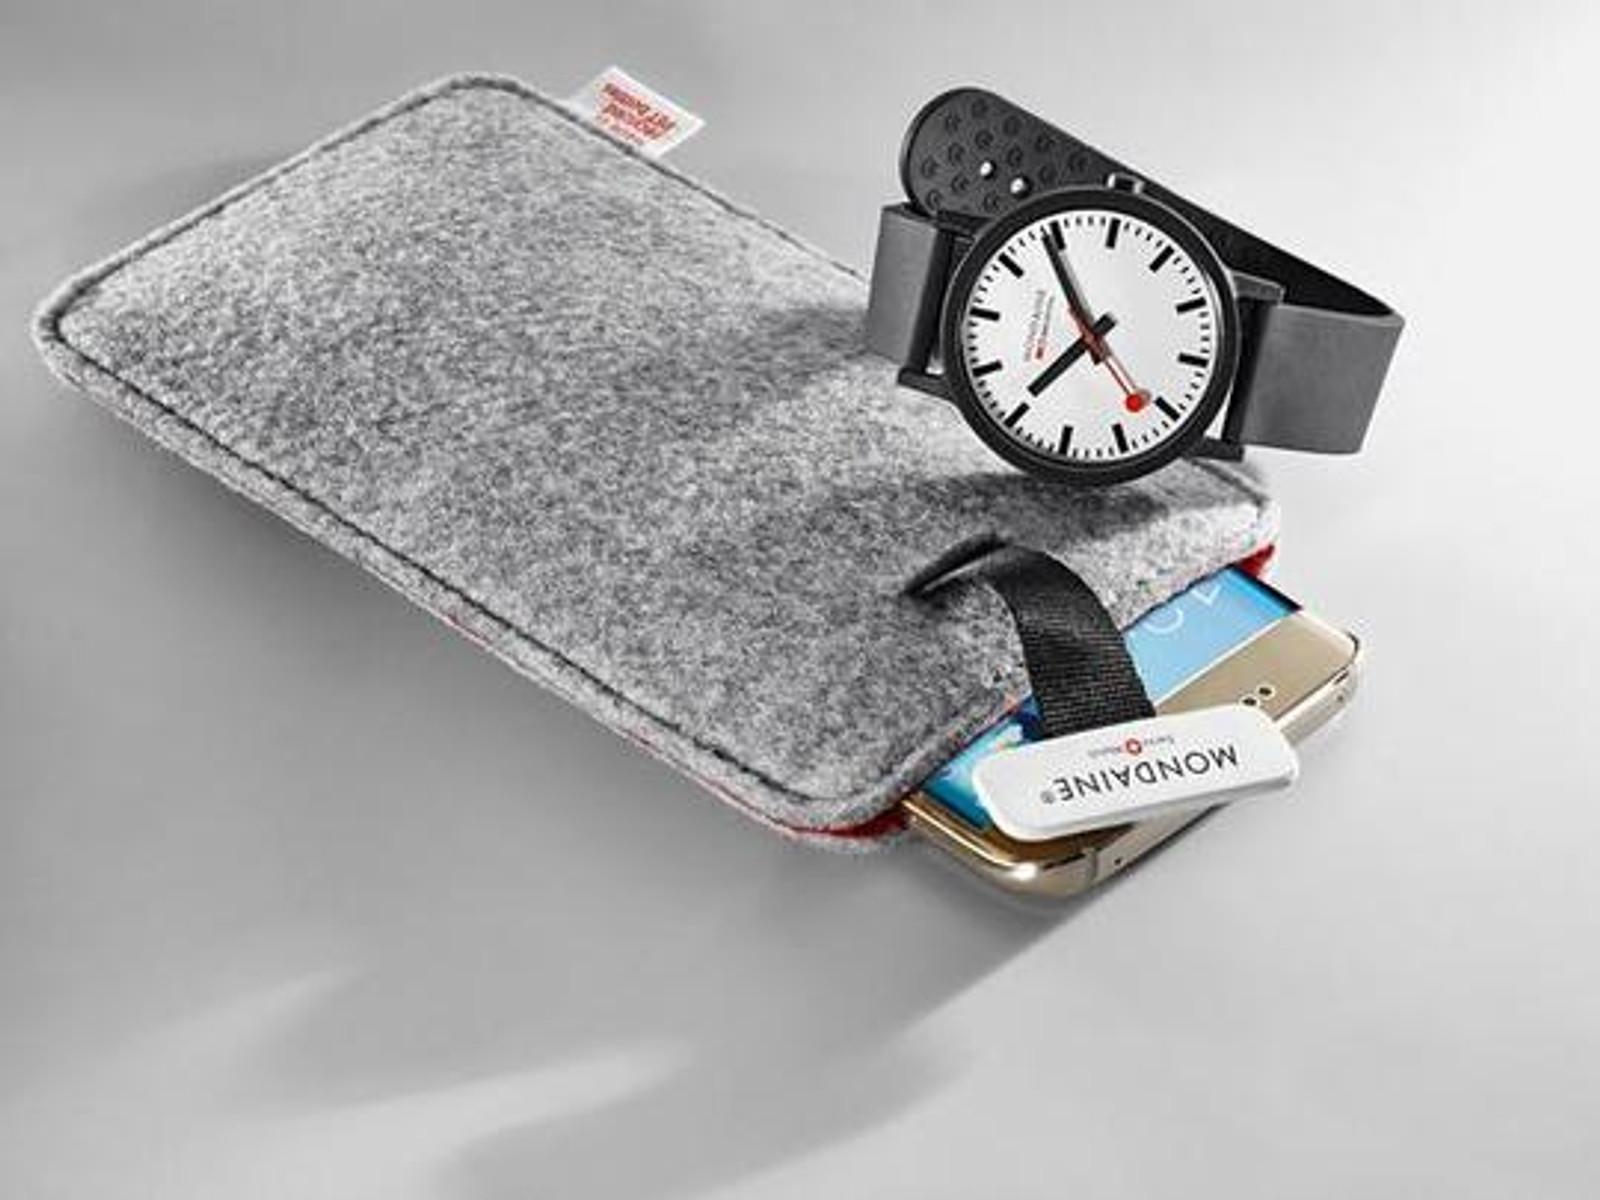 Essence 41mm - Black dial